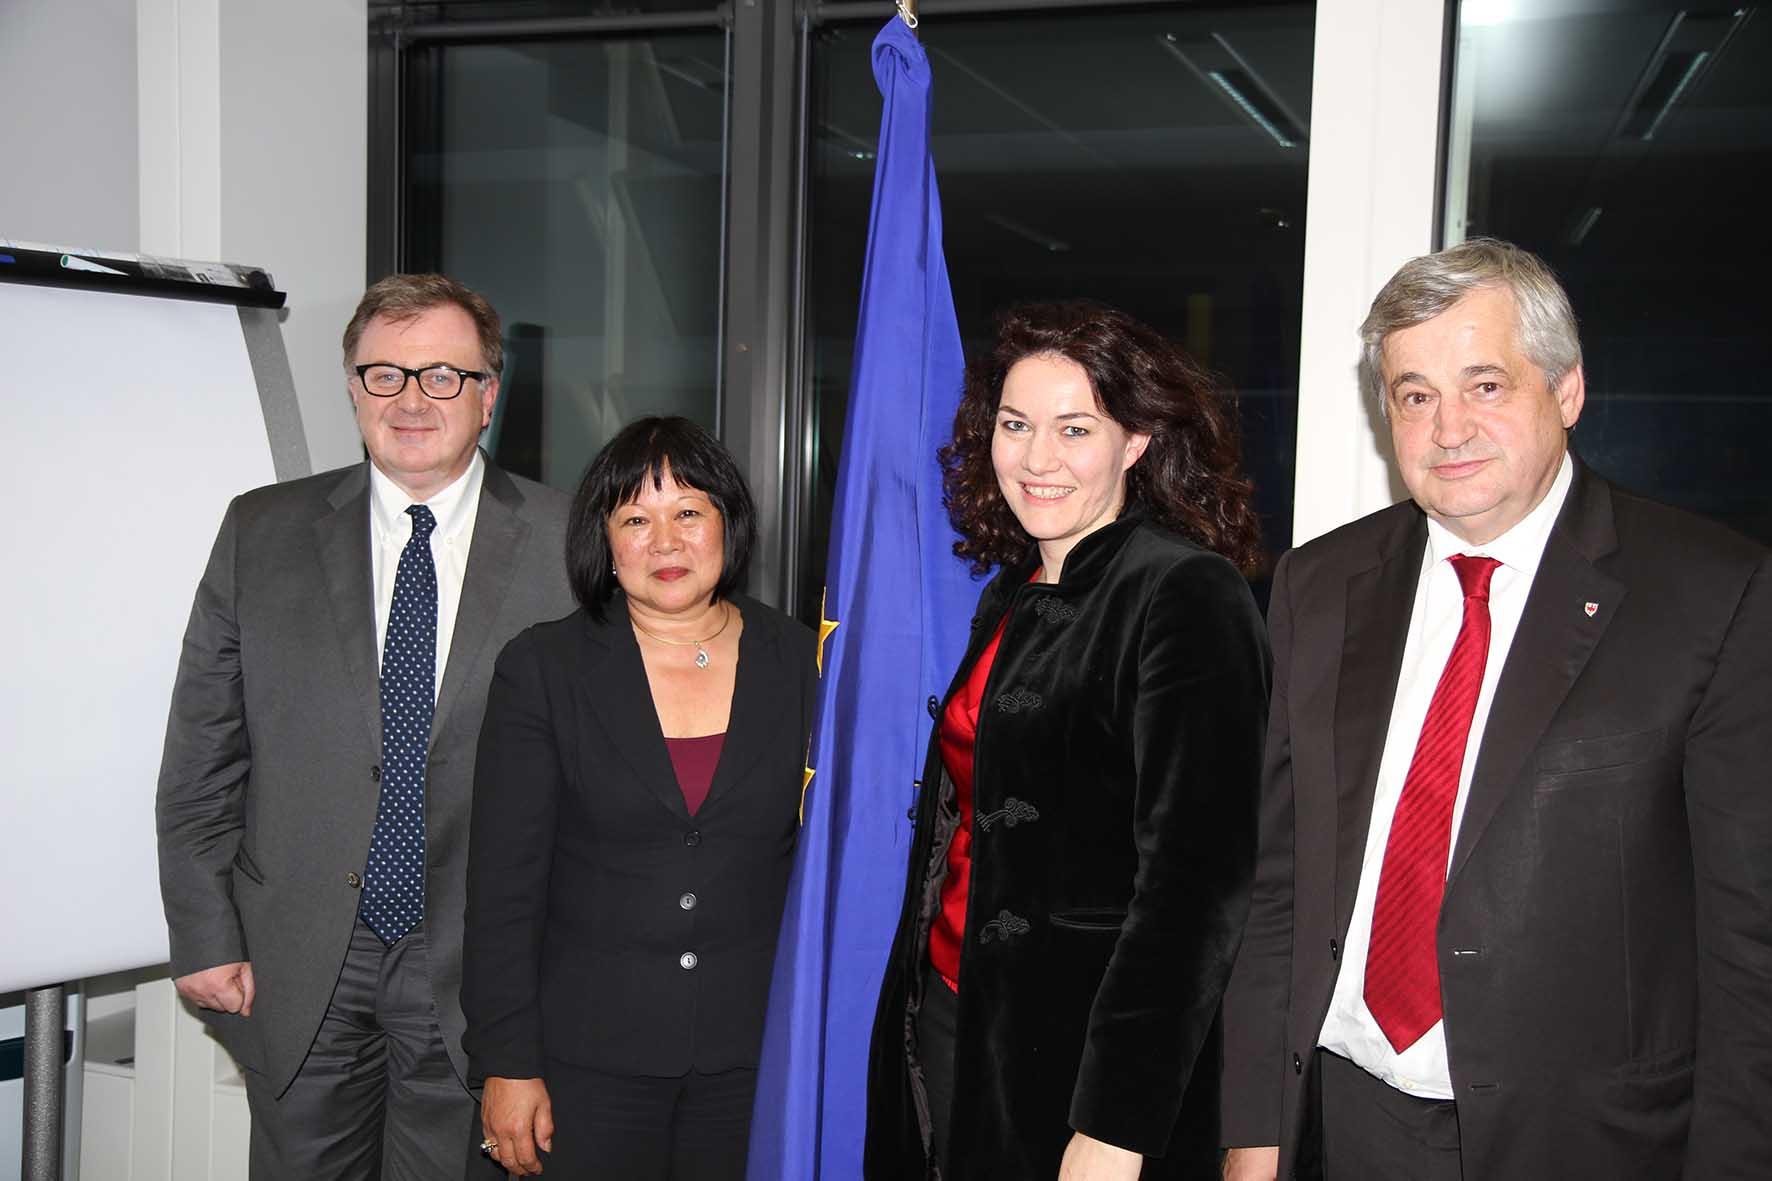 Euregio tirolo funzionaria UE Desiree Oen fra i tre assessori dellEuregio Mauro Gilmozzi Ingrid Felipe e Florian Mussner